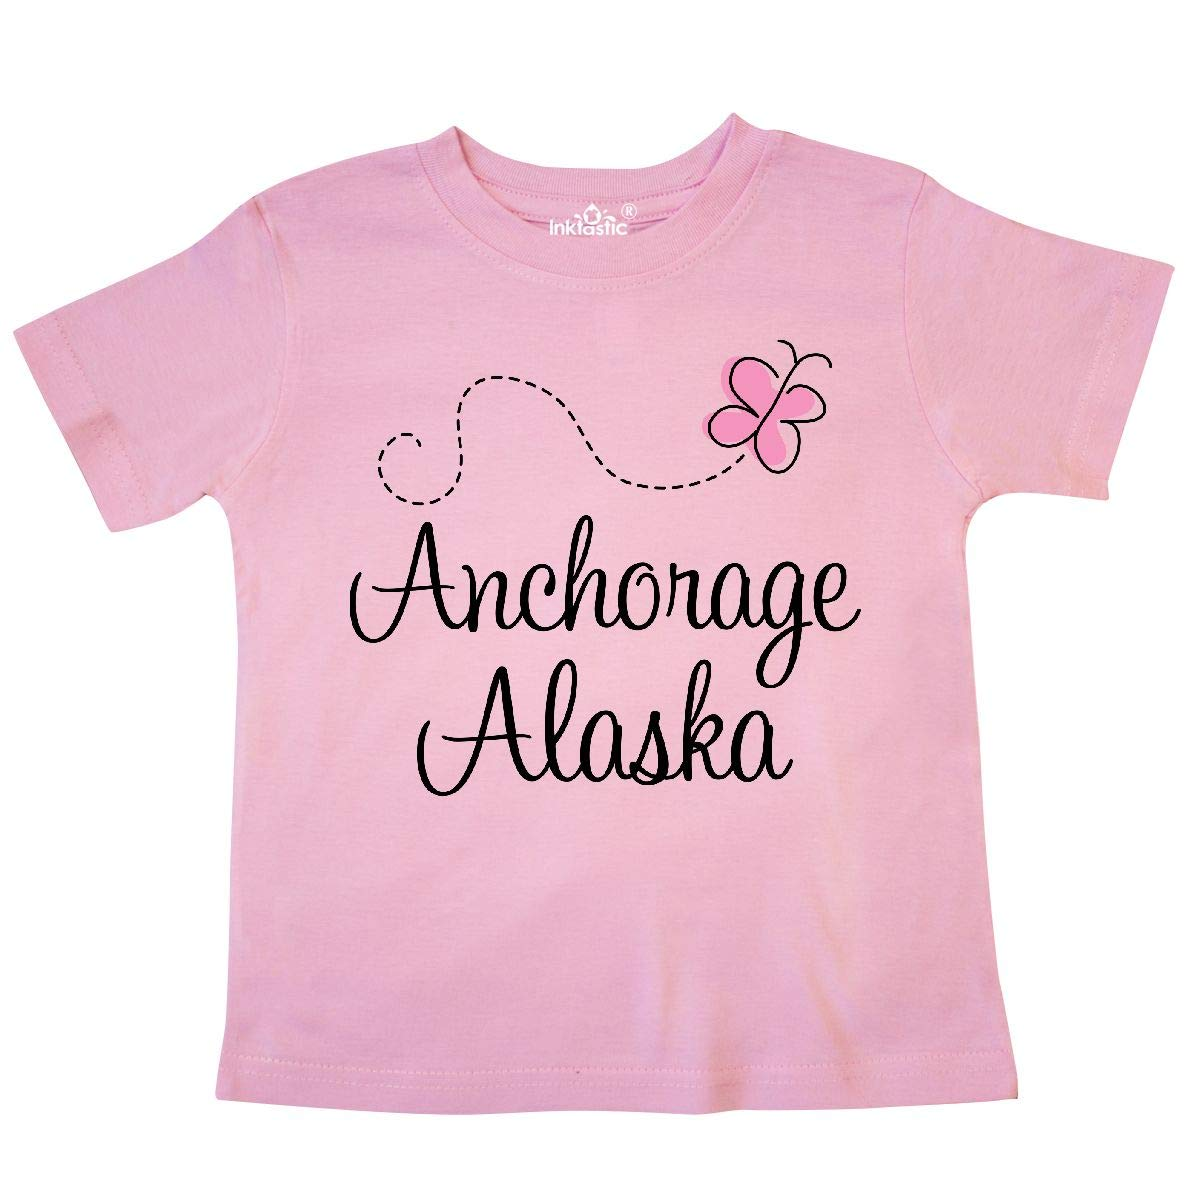 inktastic Anchorage Alaska Toddler T-Shirt